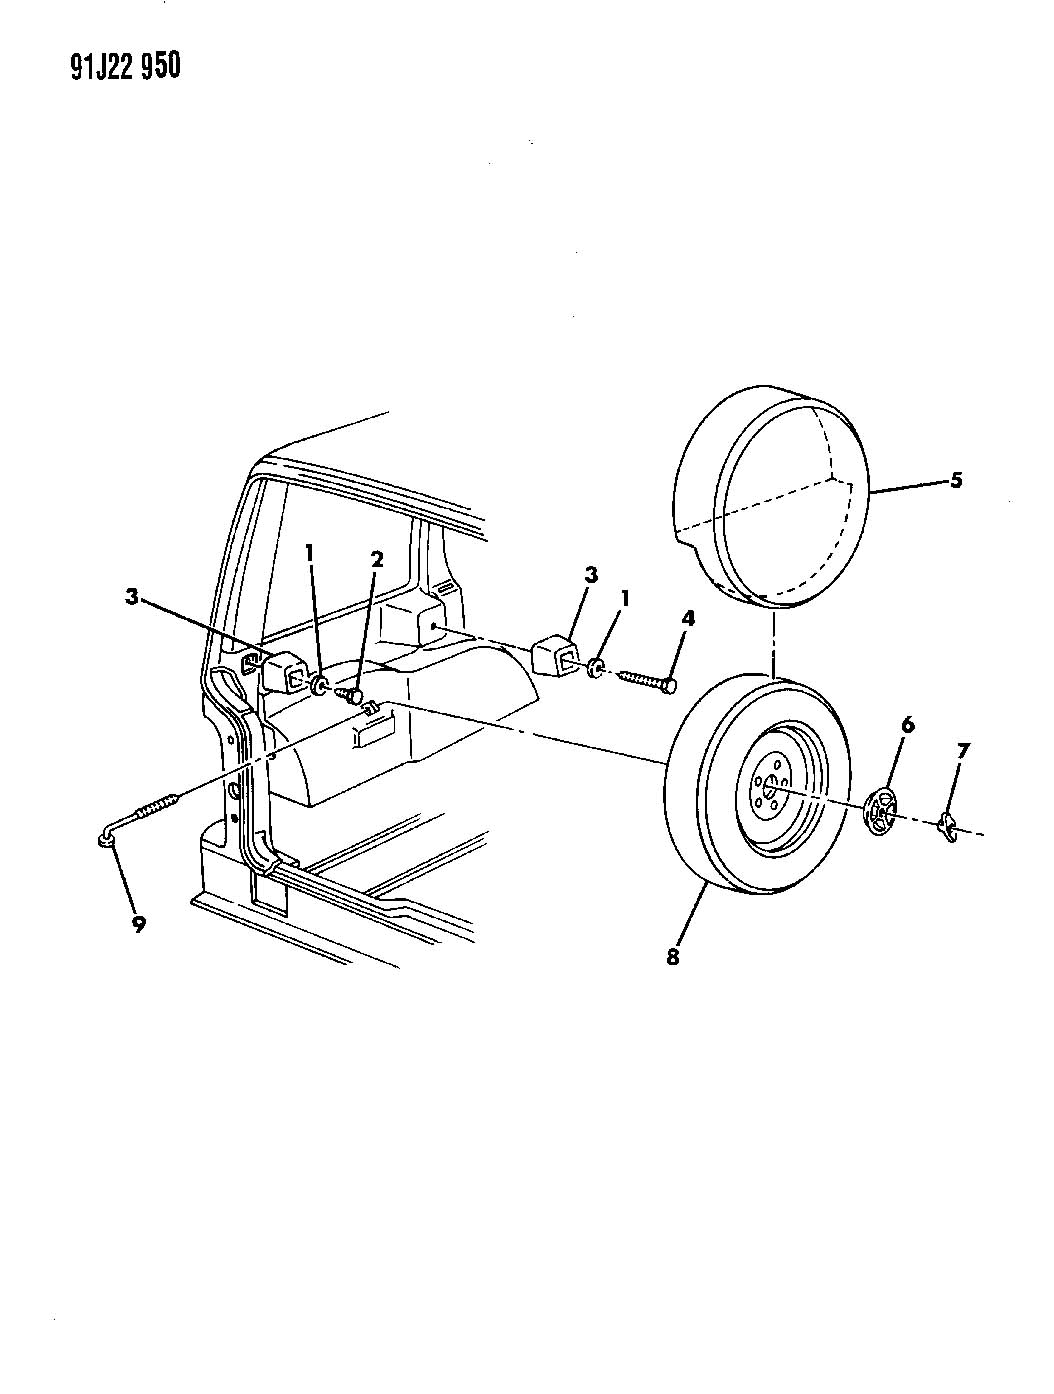 Jeep Grand Cherokee Wheel Spare Inside Mounting Grand